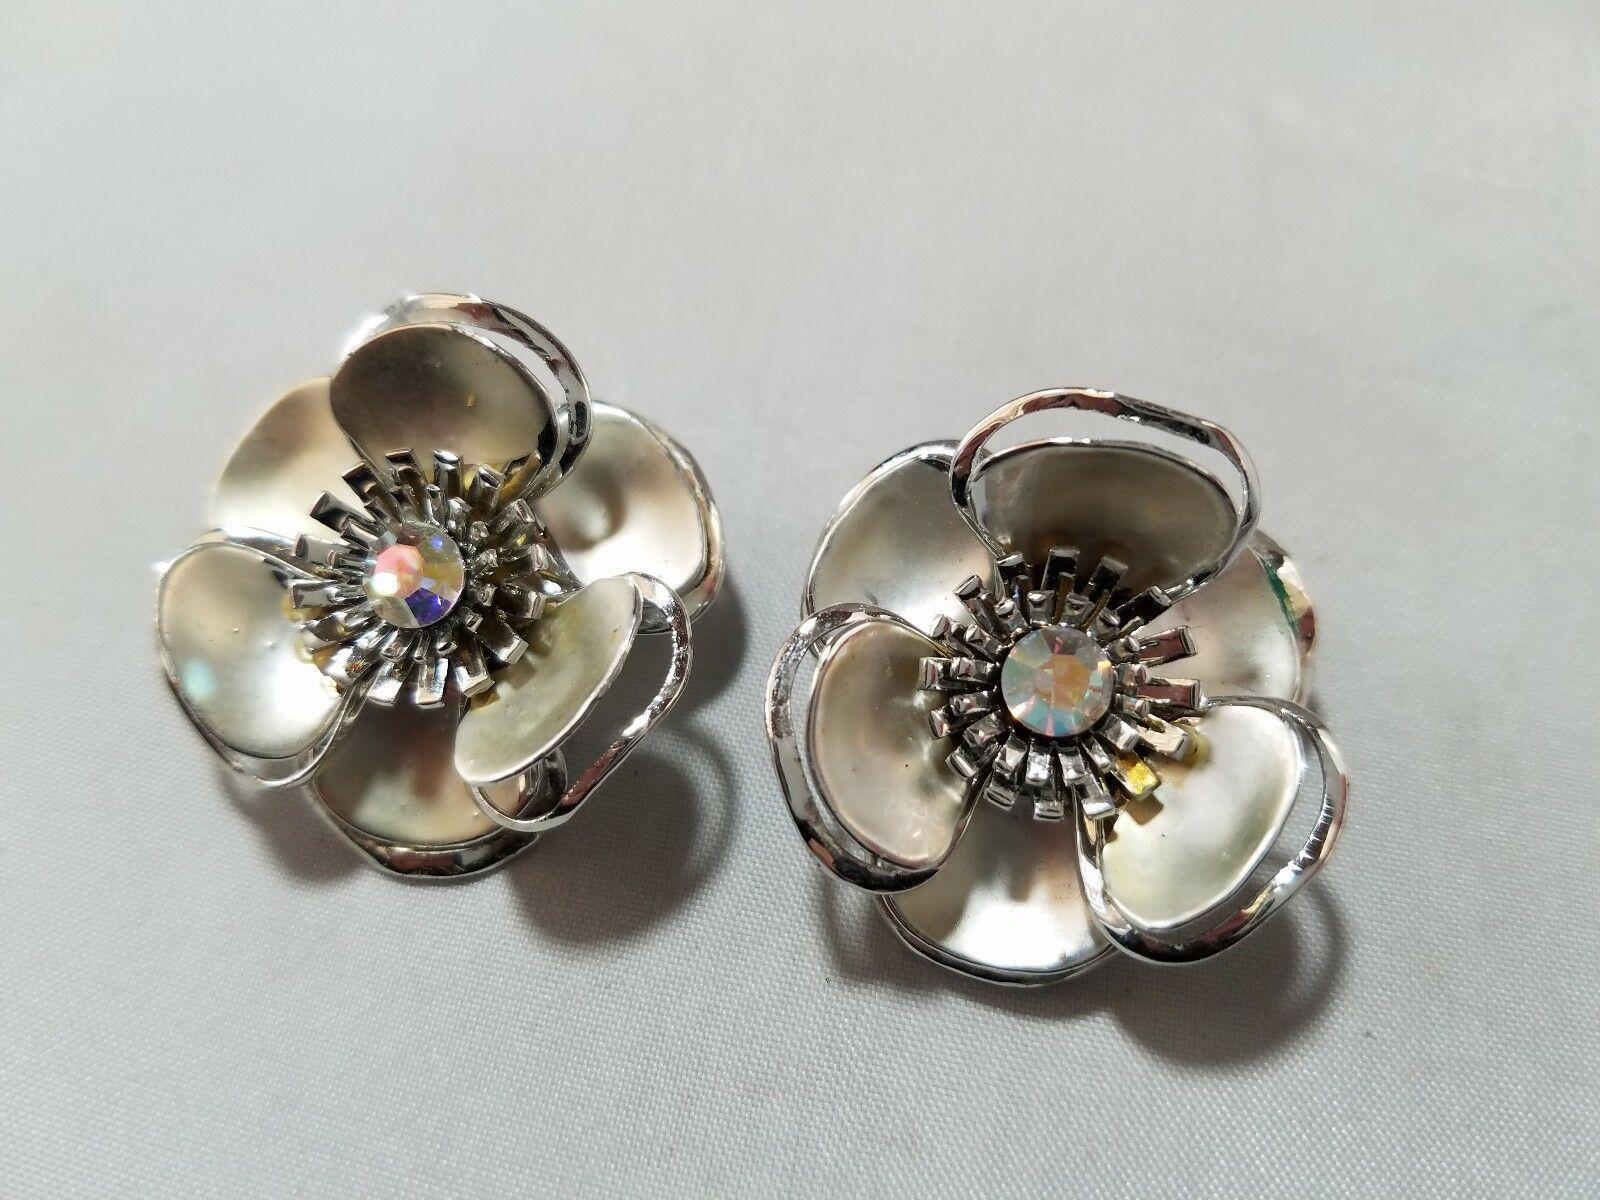 Vintage Fashion Jewelry Set Silver Tone Flower Clip On Earrings & Brooch Pin